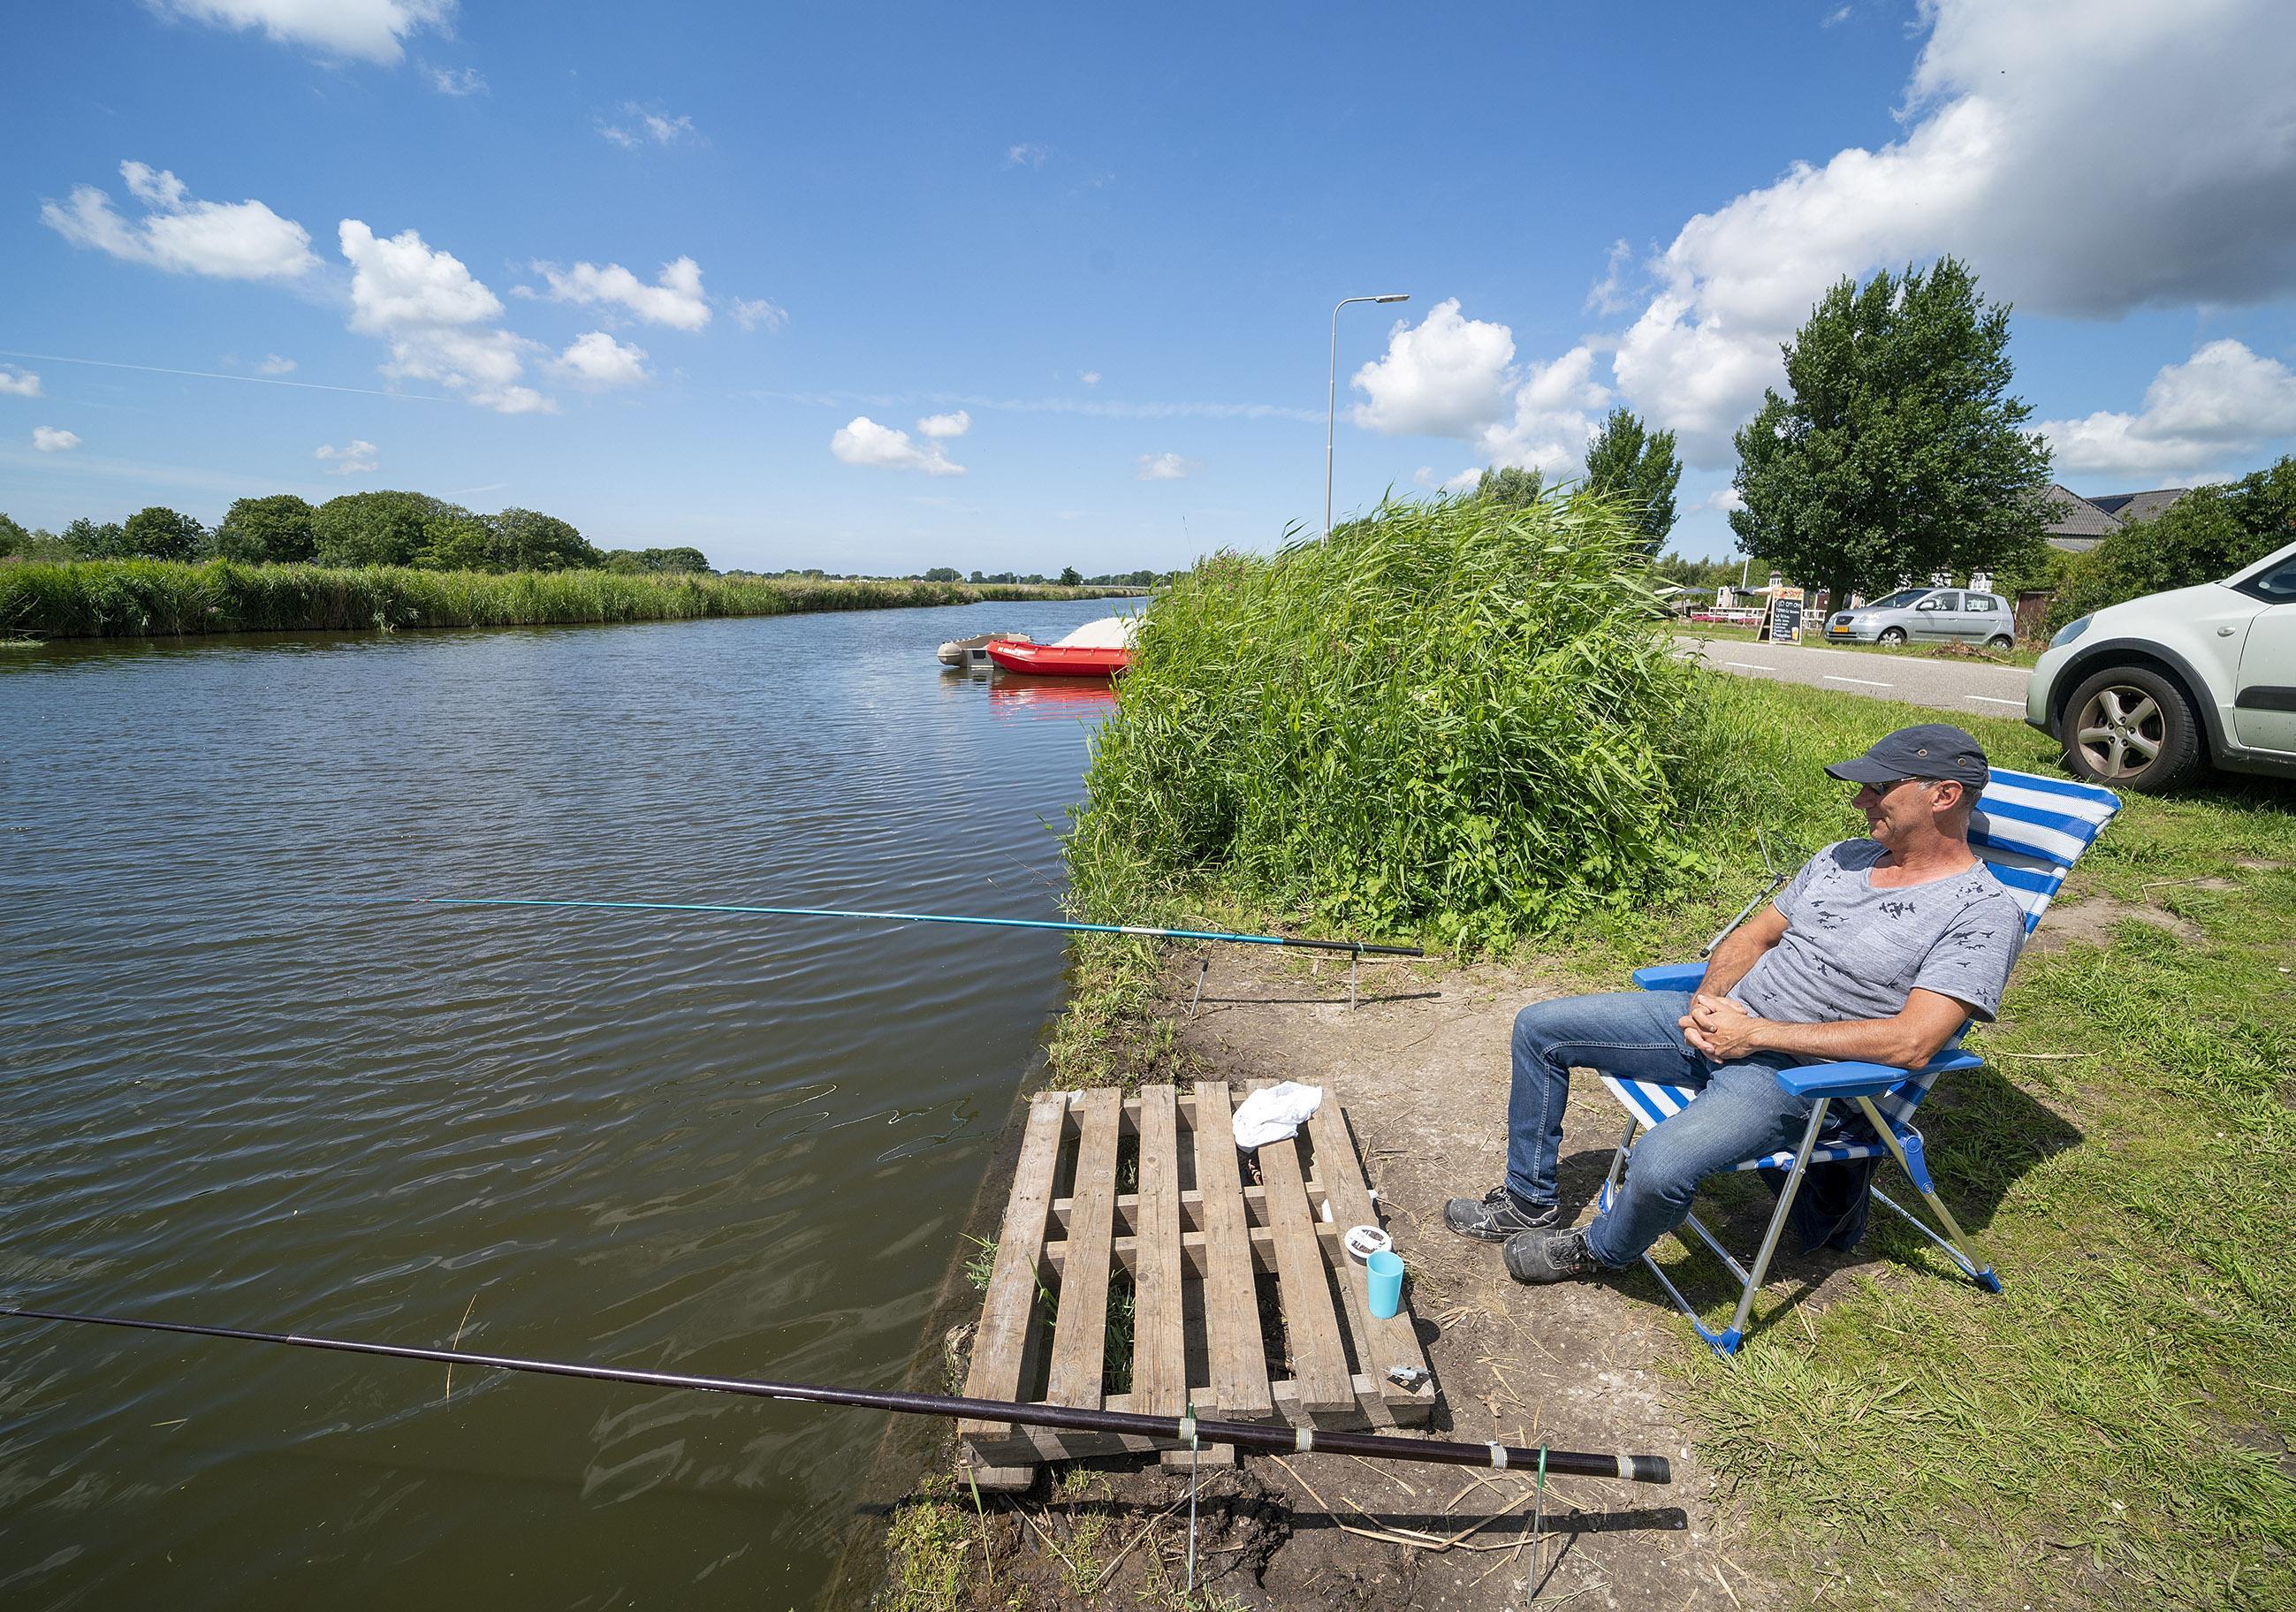 Ergernis over 'illegale' botenhelling. Provincie wil deugdelijke trailerhelling bij Poldermuseum in Heerhugowaard